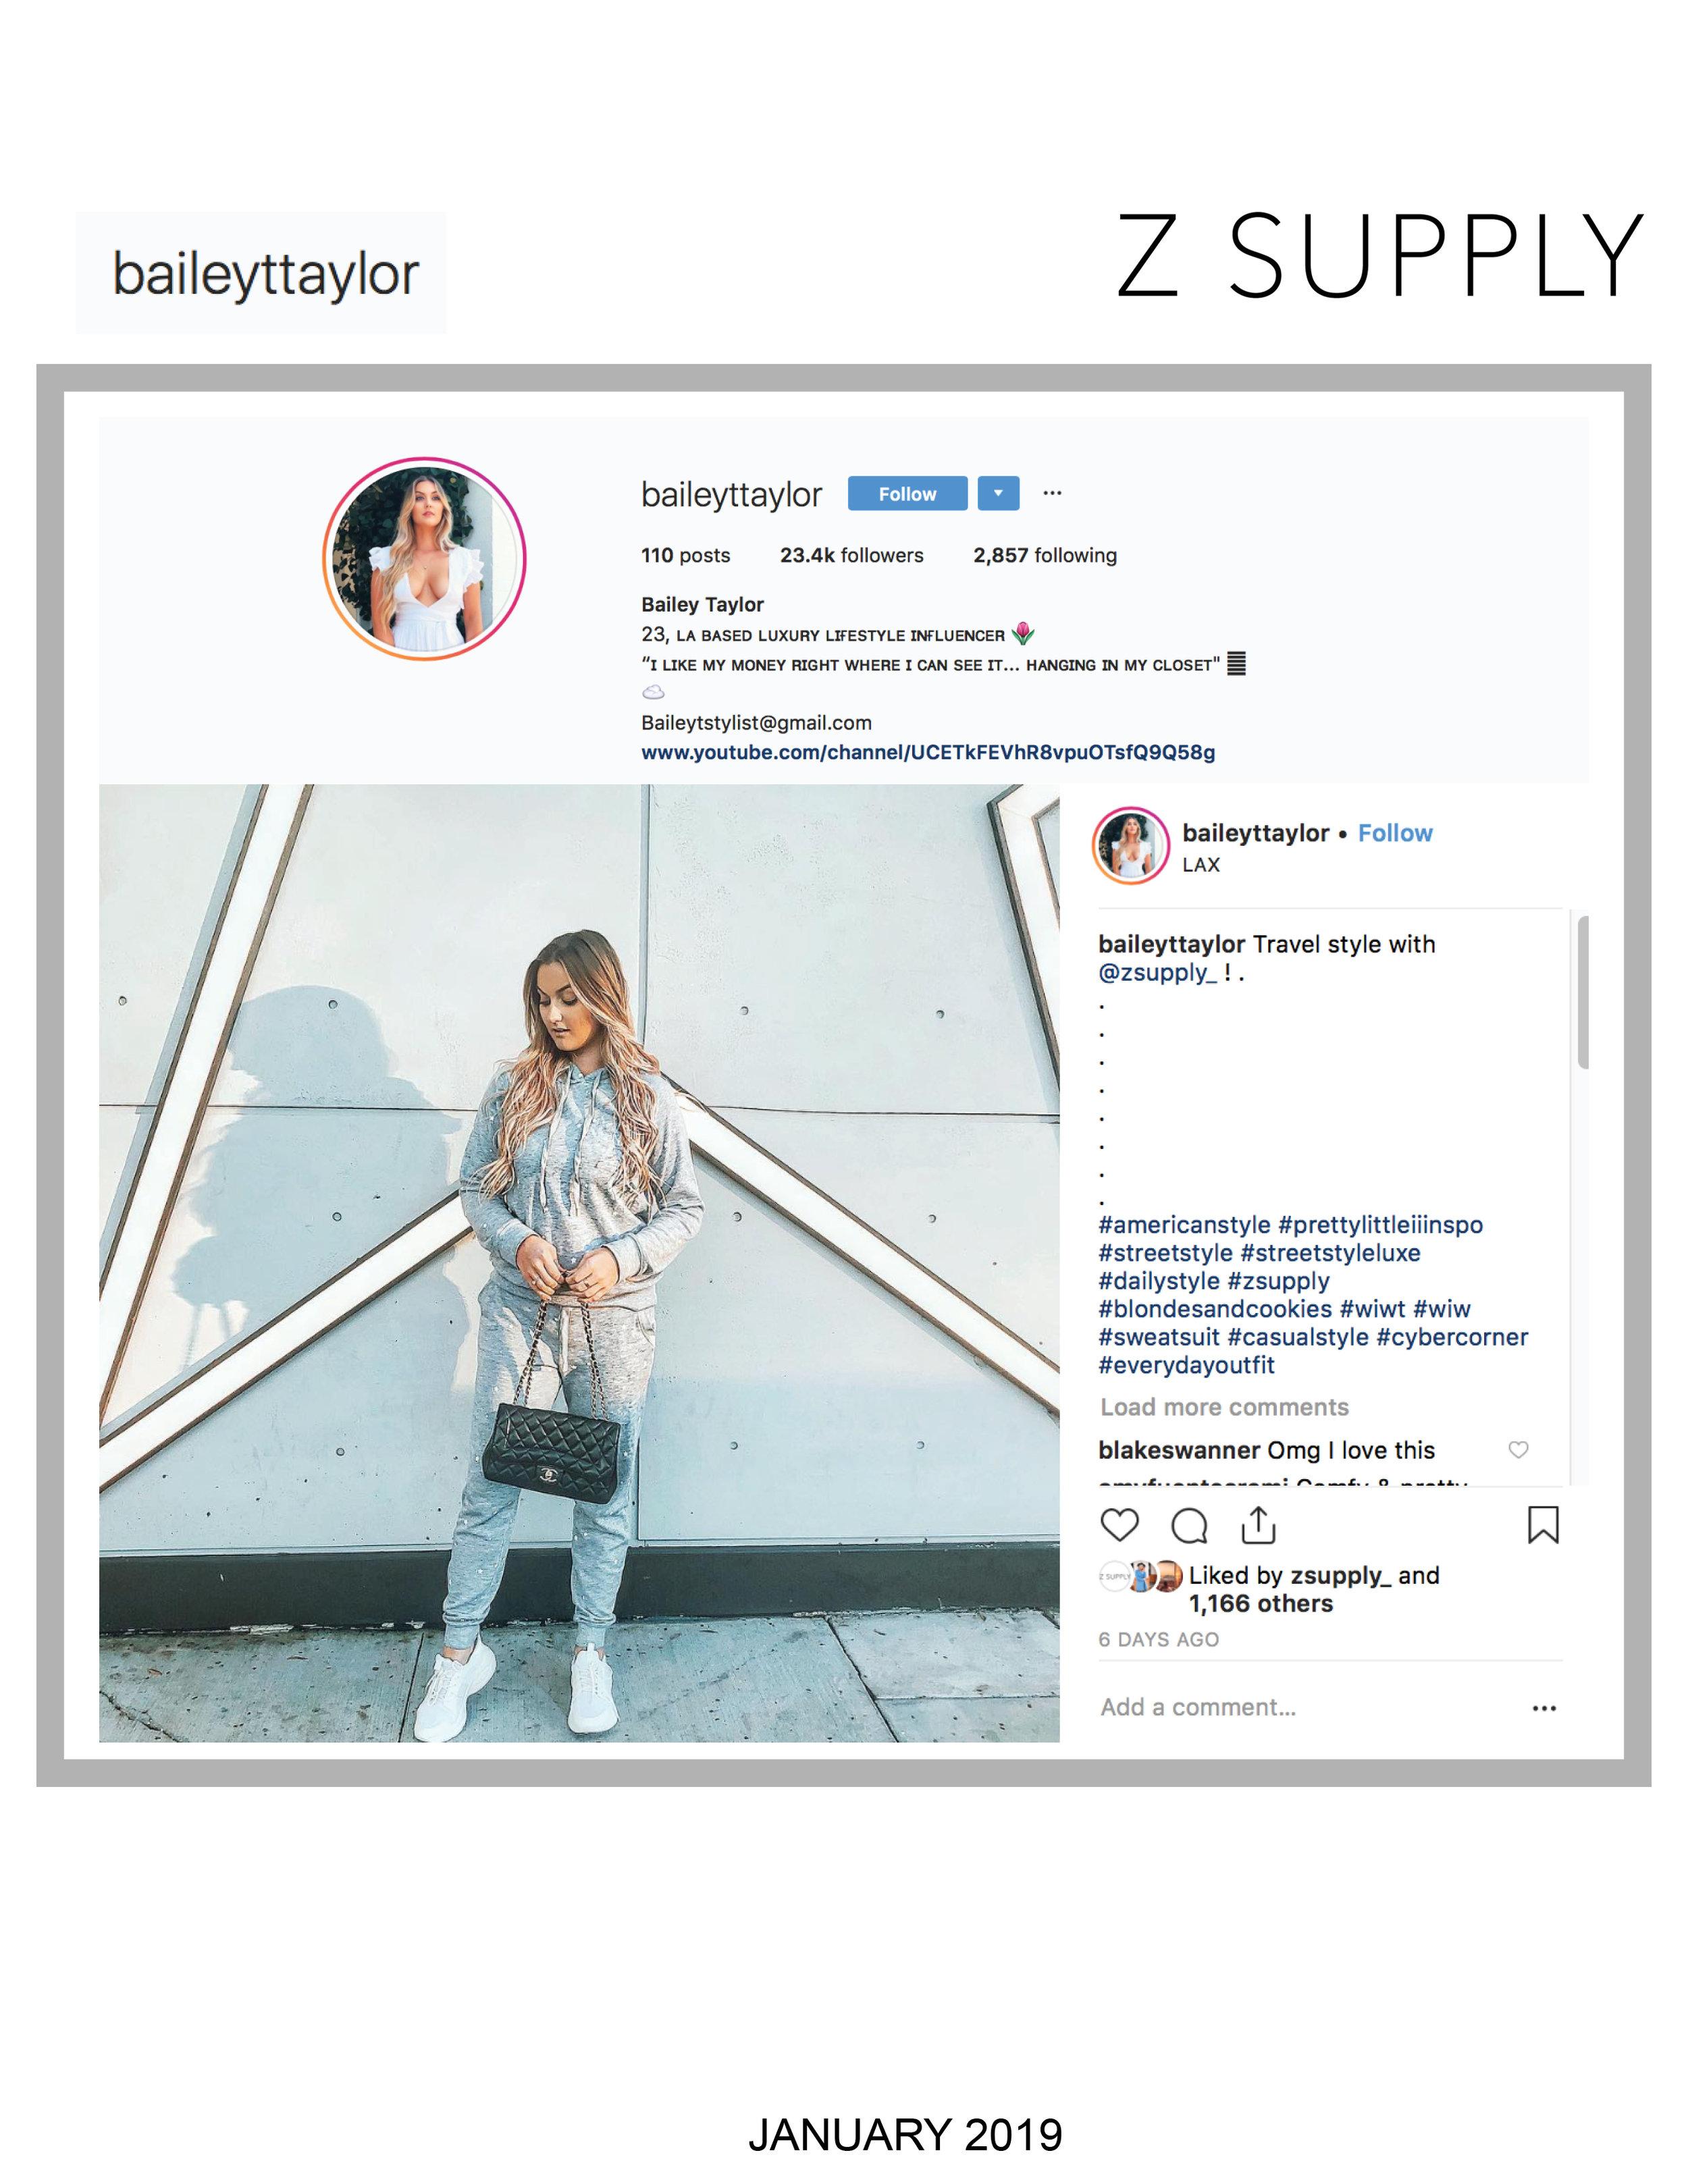 ZSupply_BaileyTaylor_January2019.jpg